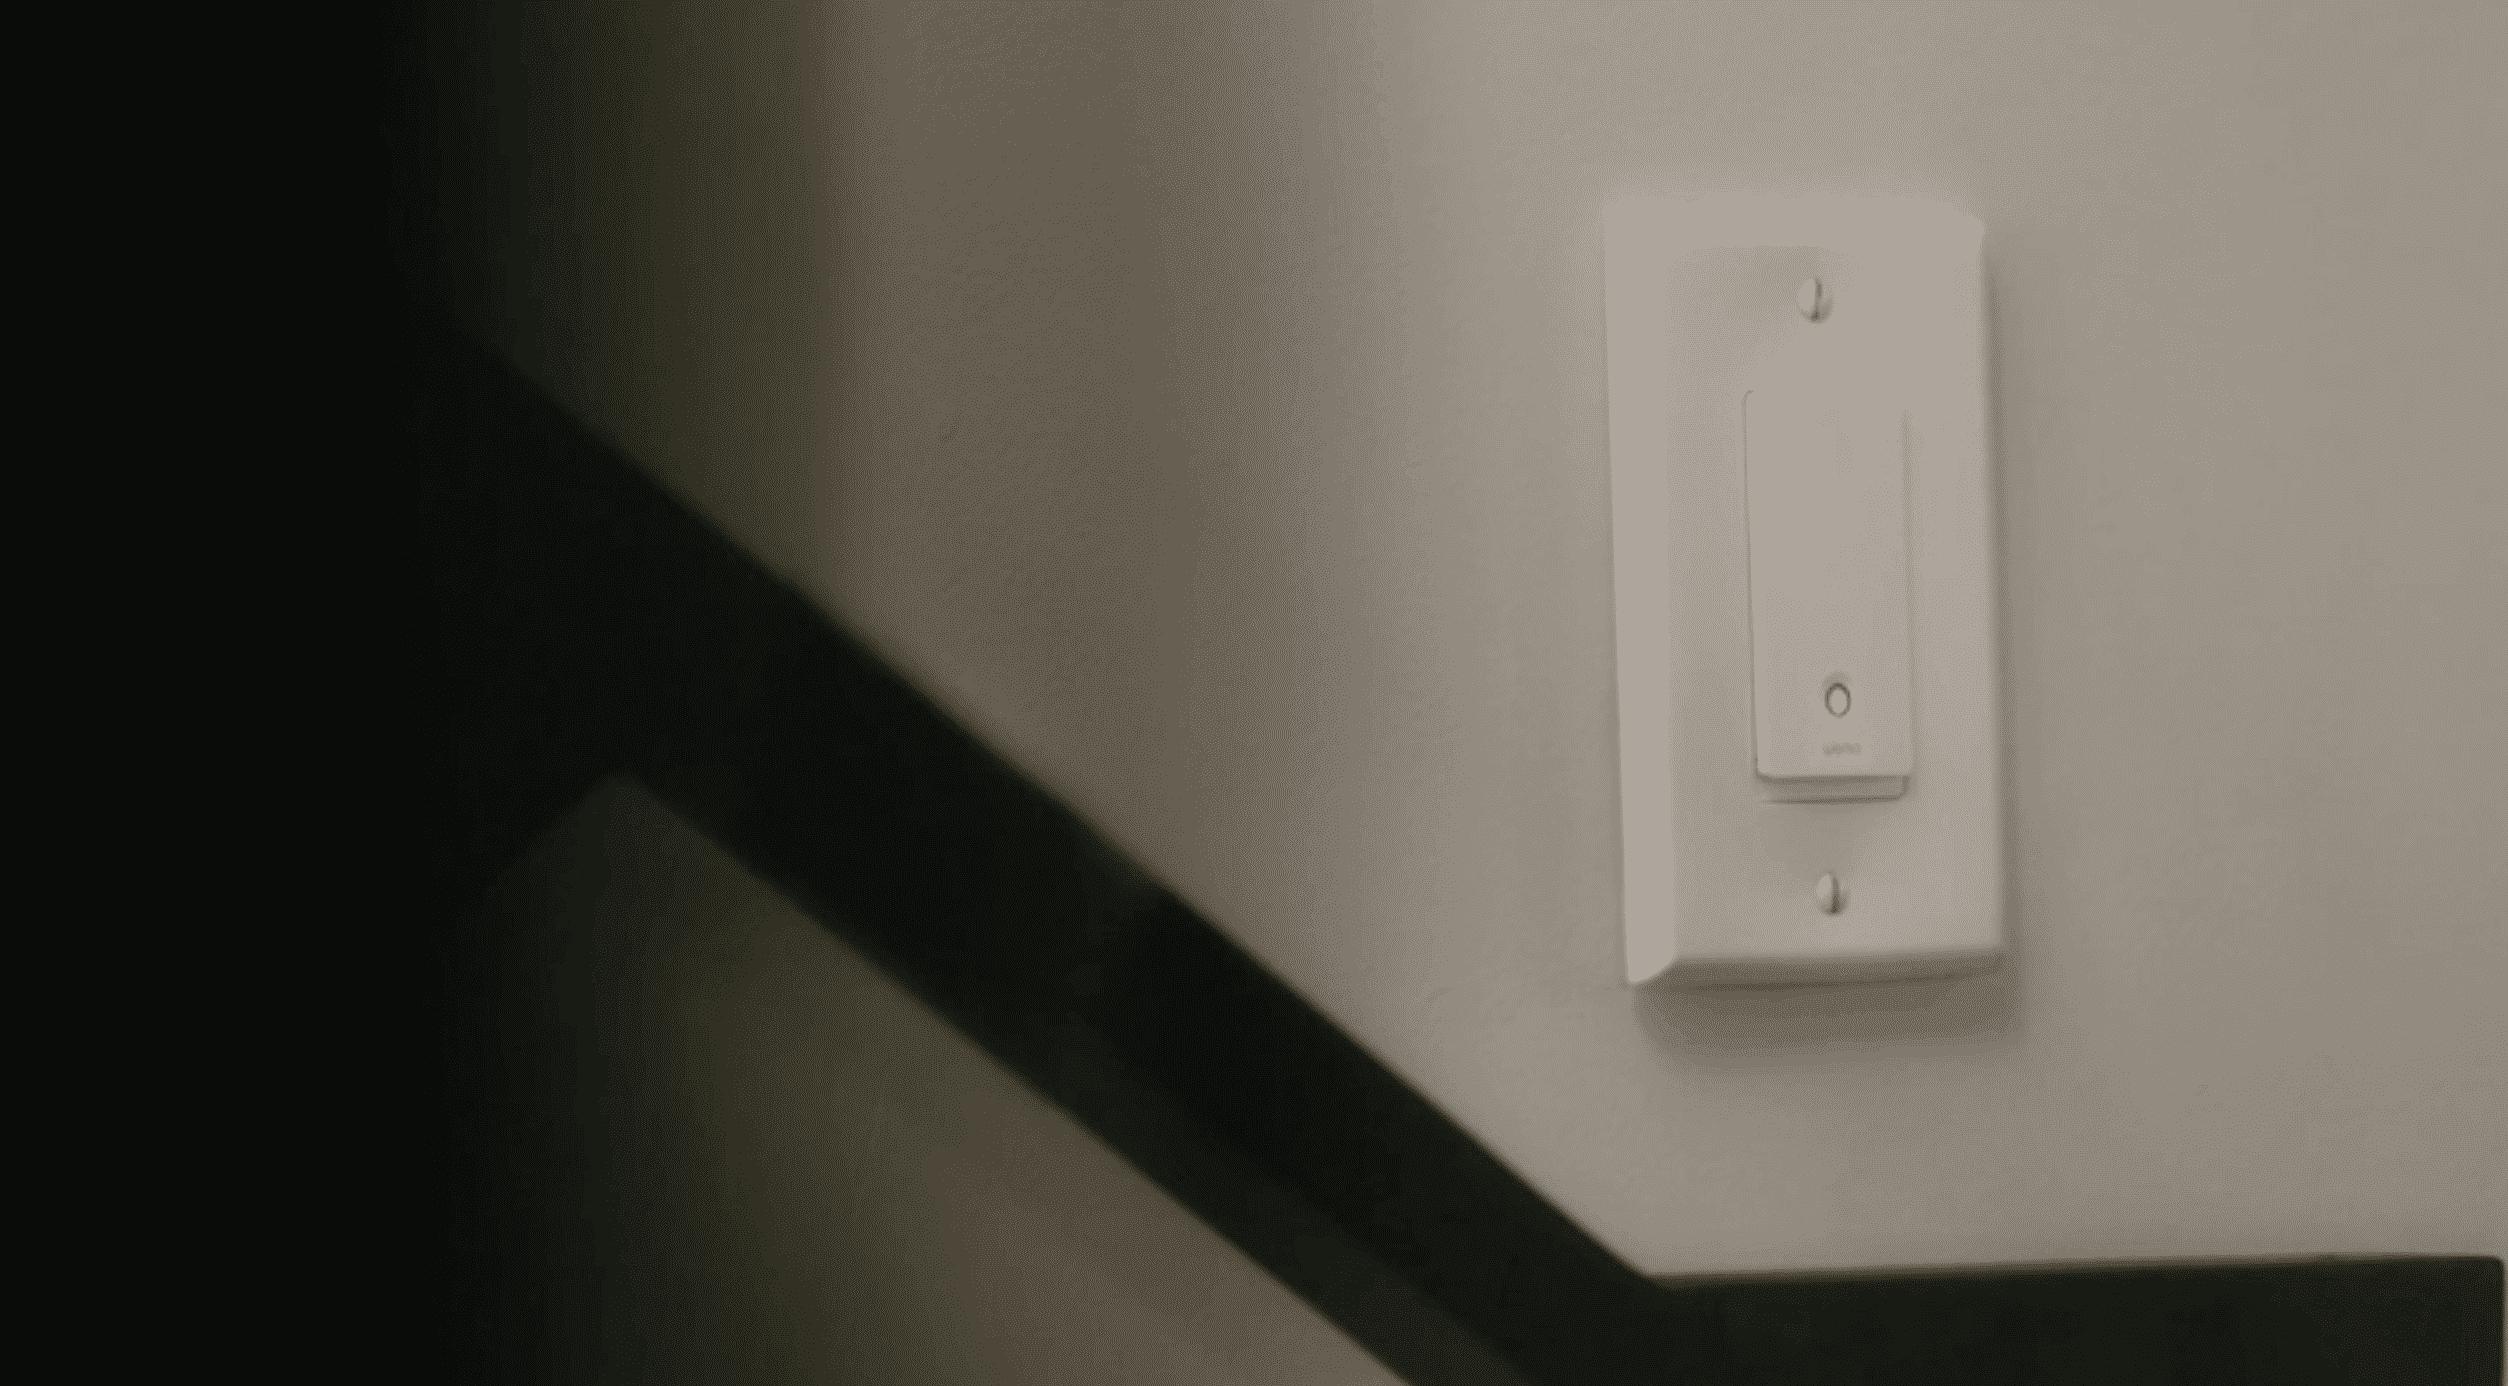 Wemo Smart Light Switch